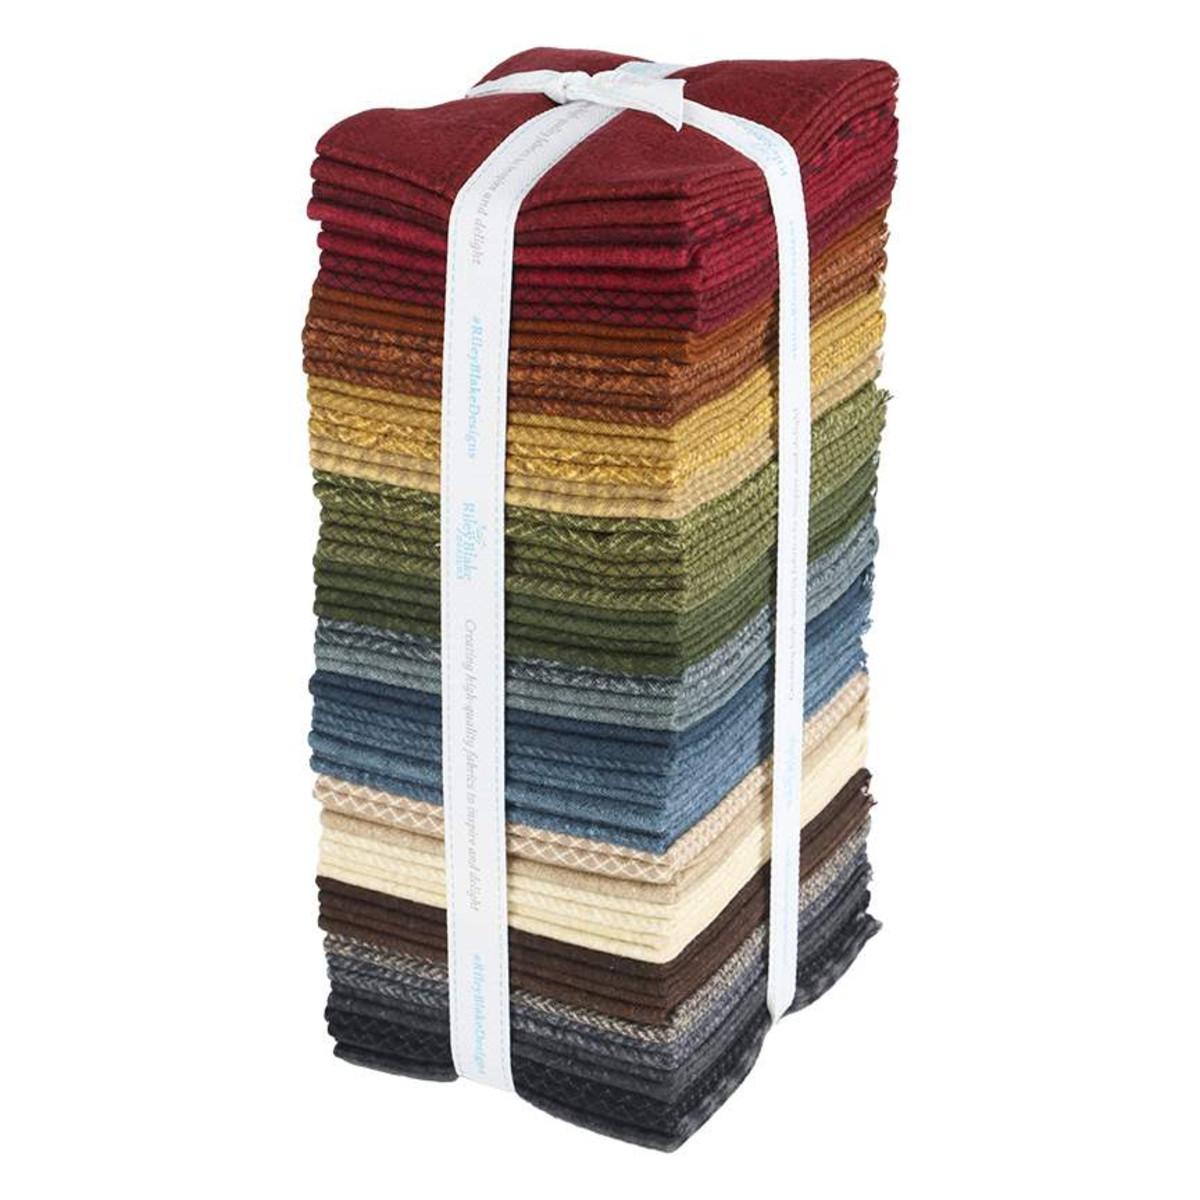 Riley Blake Fat Quarter Bundle - Woolen Flannel by Stacy West